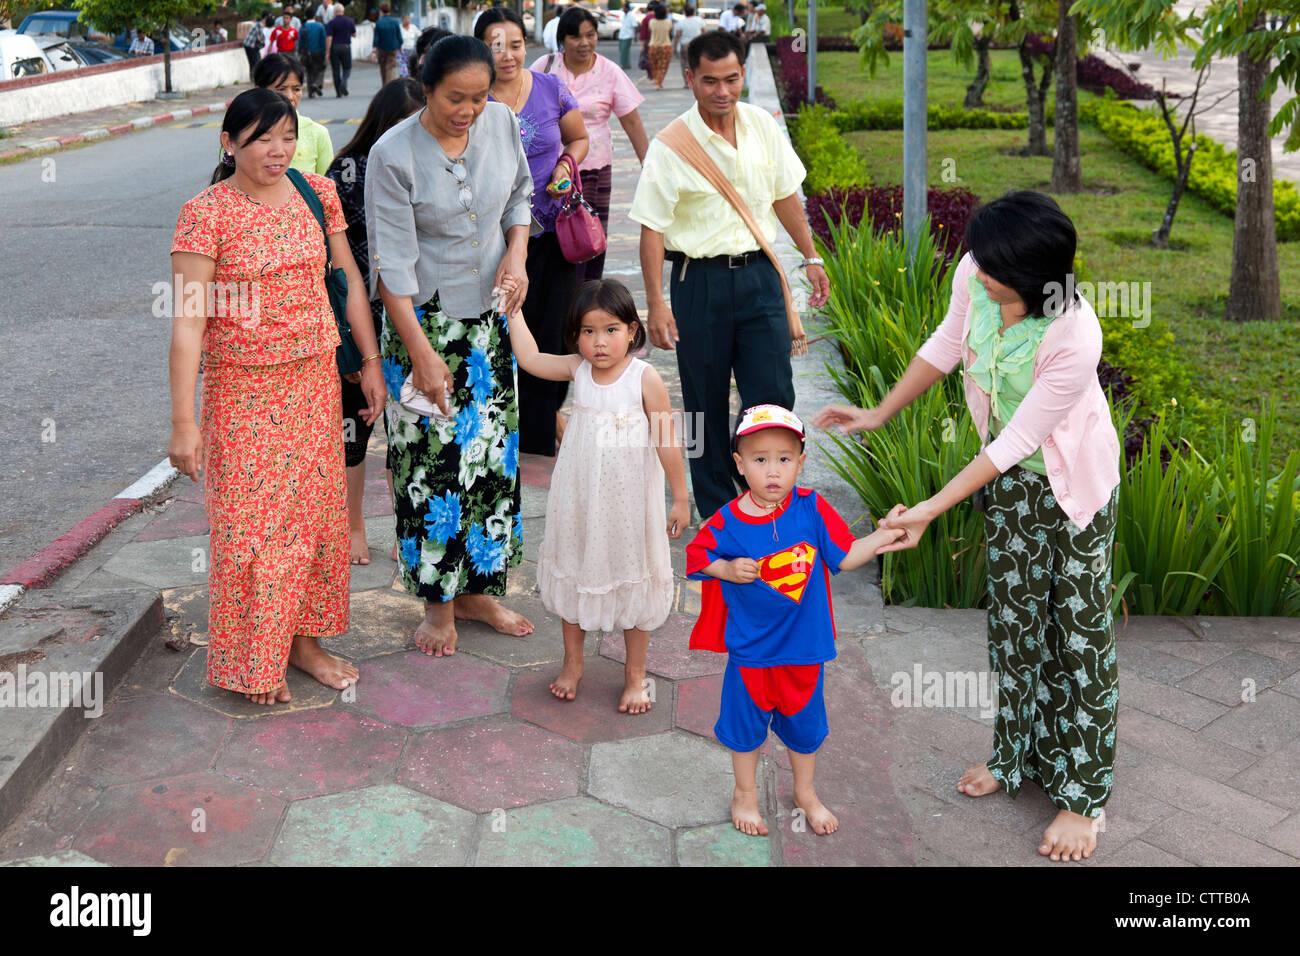 Burmese family, Yangon, Myanmar - Stock Image